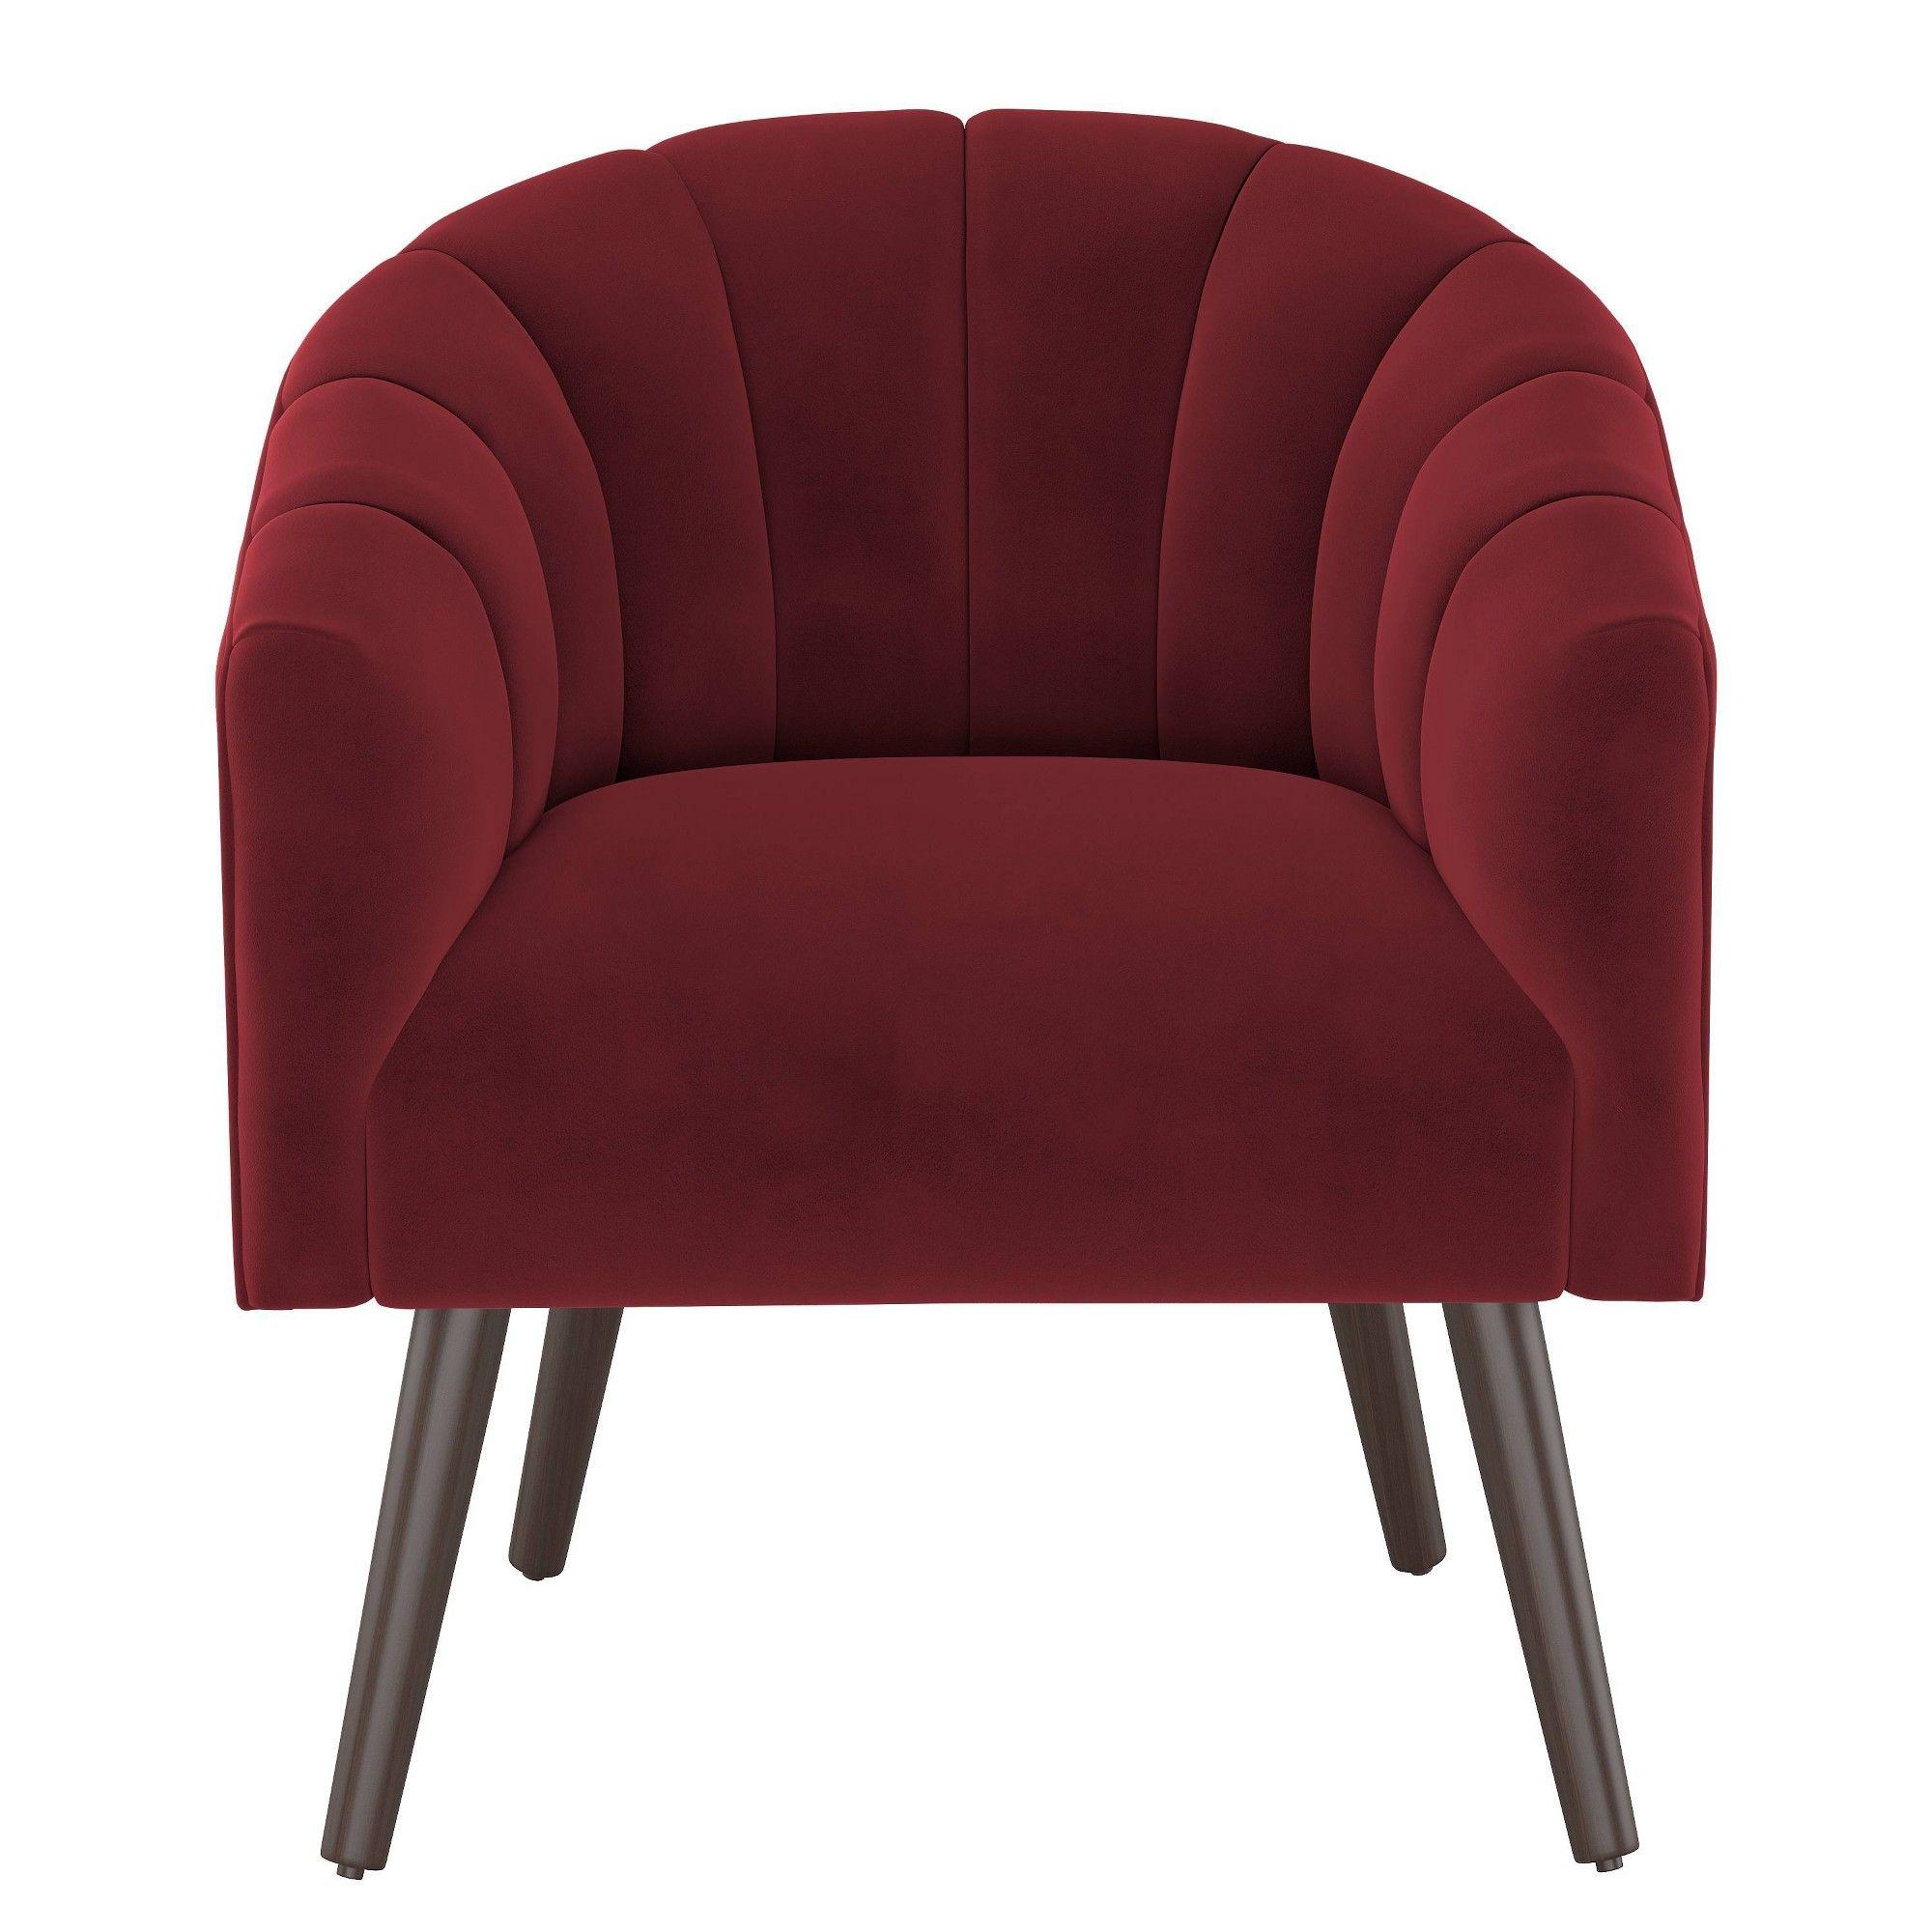 Modern Barrel Chair In Velvet Berry Red Project 62 Barrel